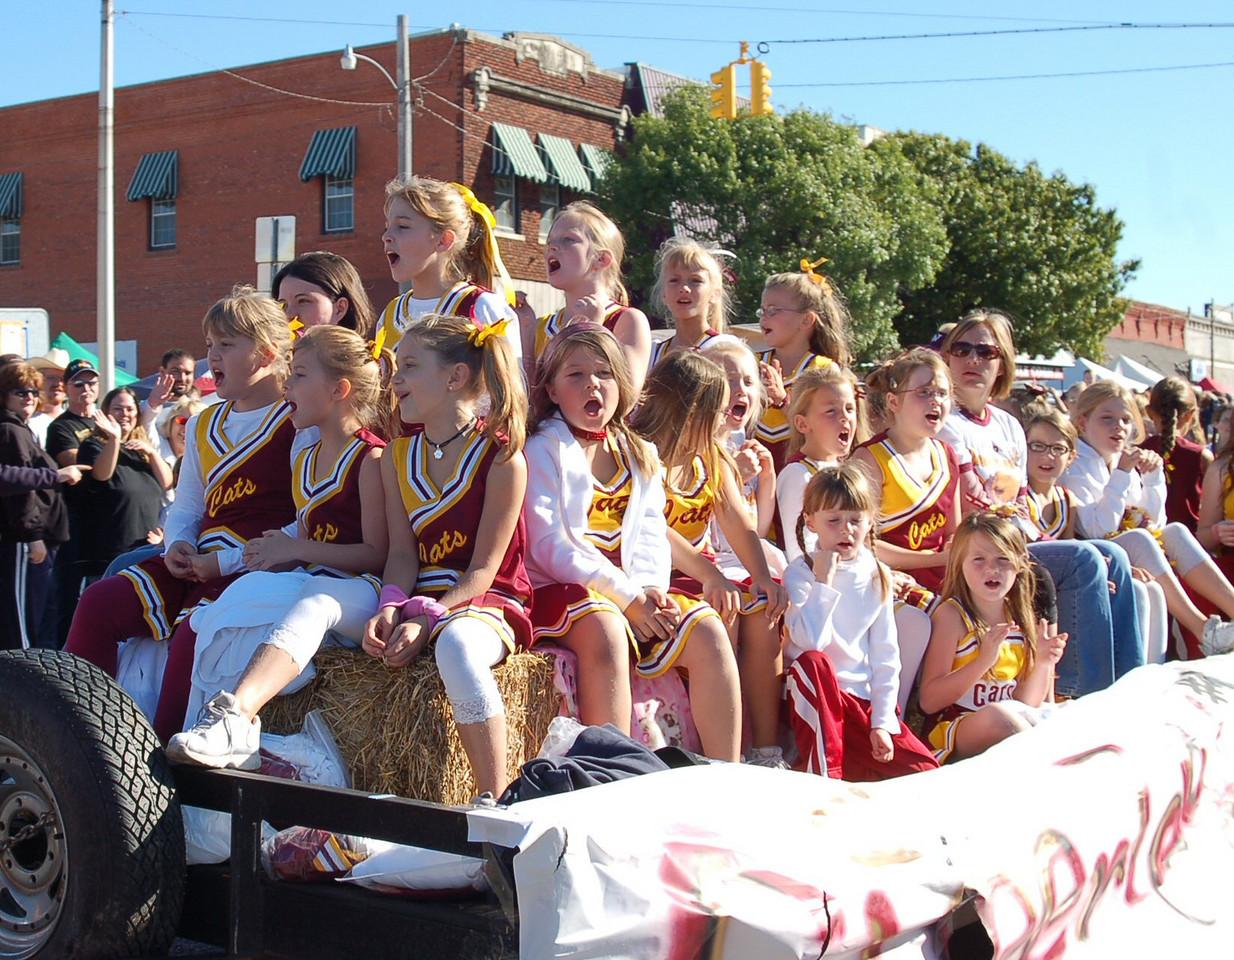 Whitesboro Peanut Festival, 2007